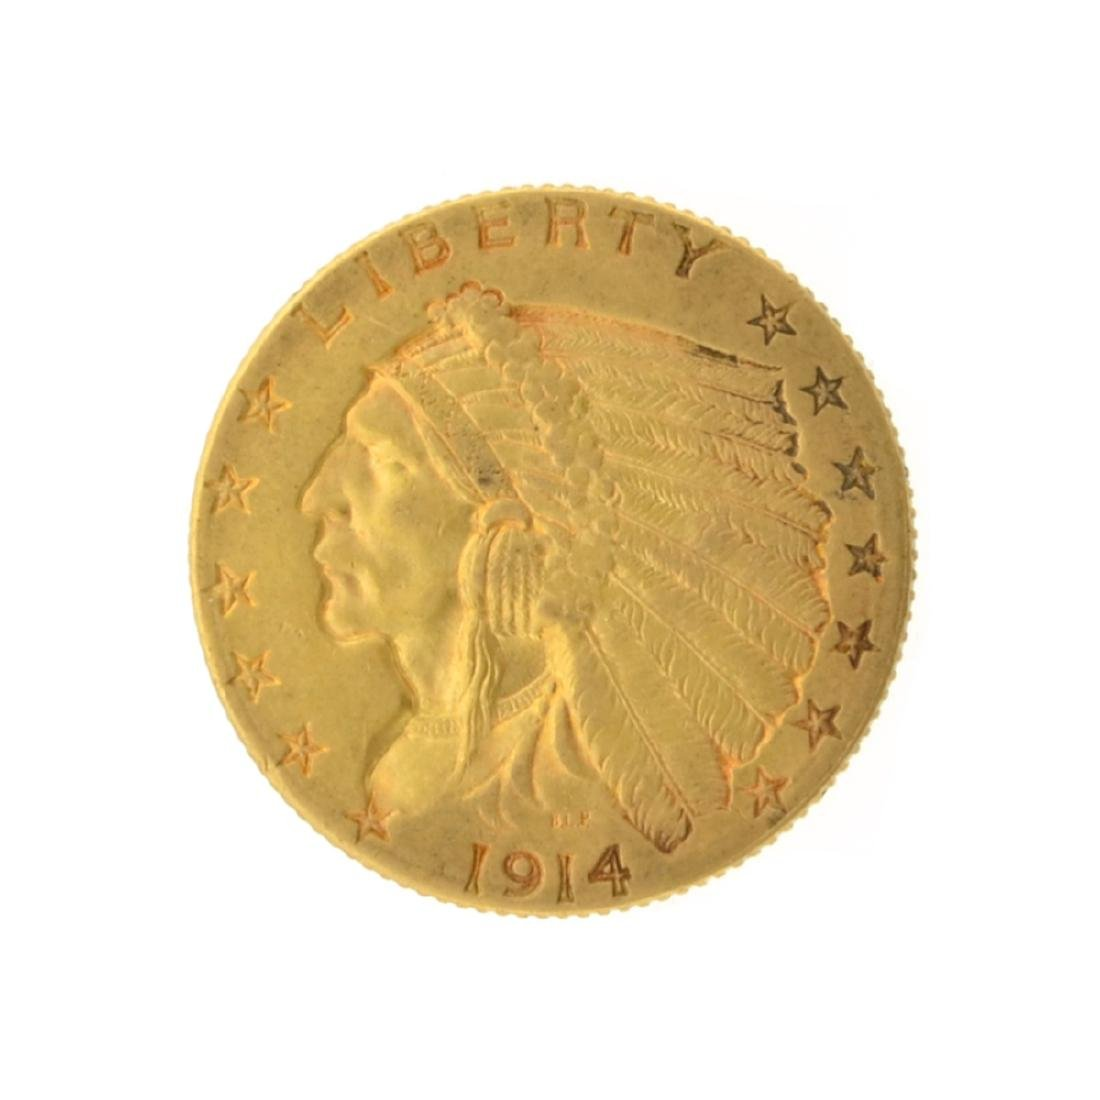 1914-D $2.50 Indian Head Gold Coin